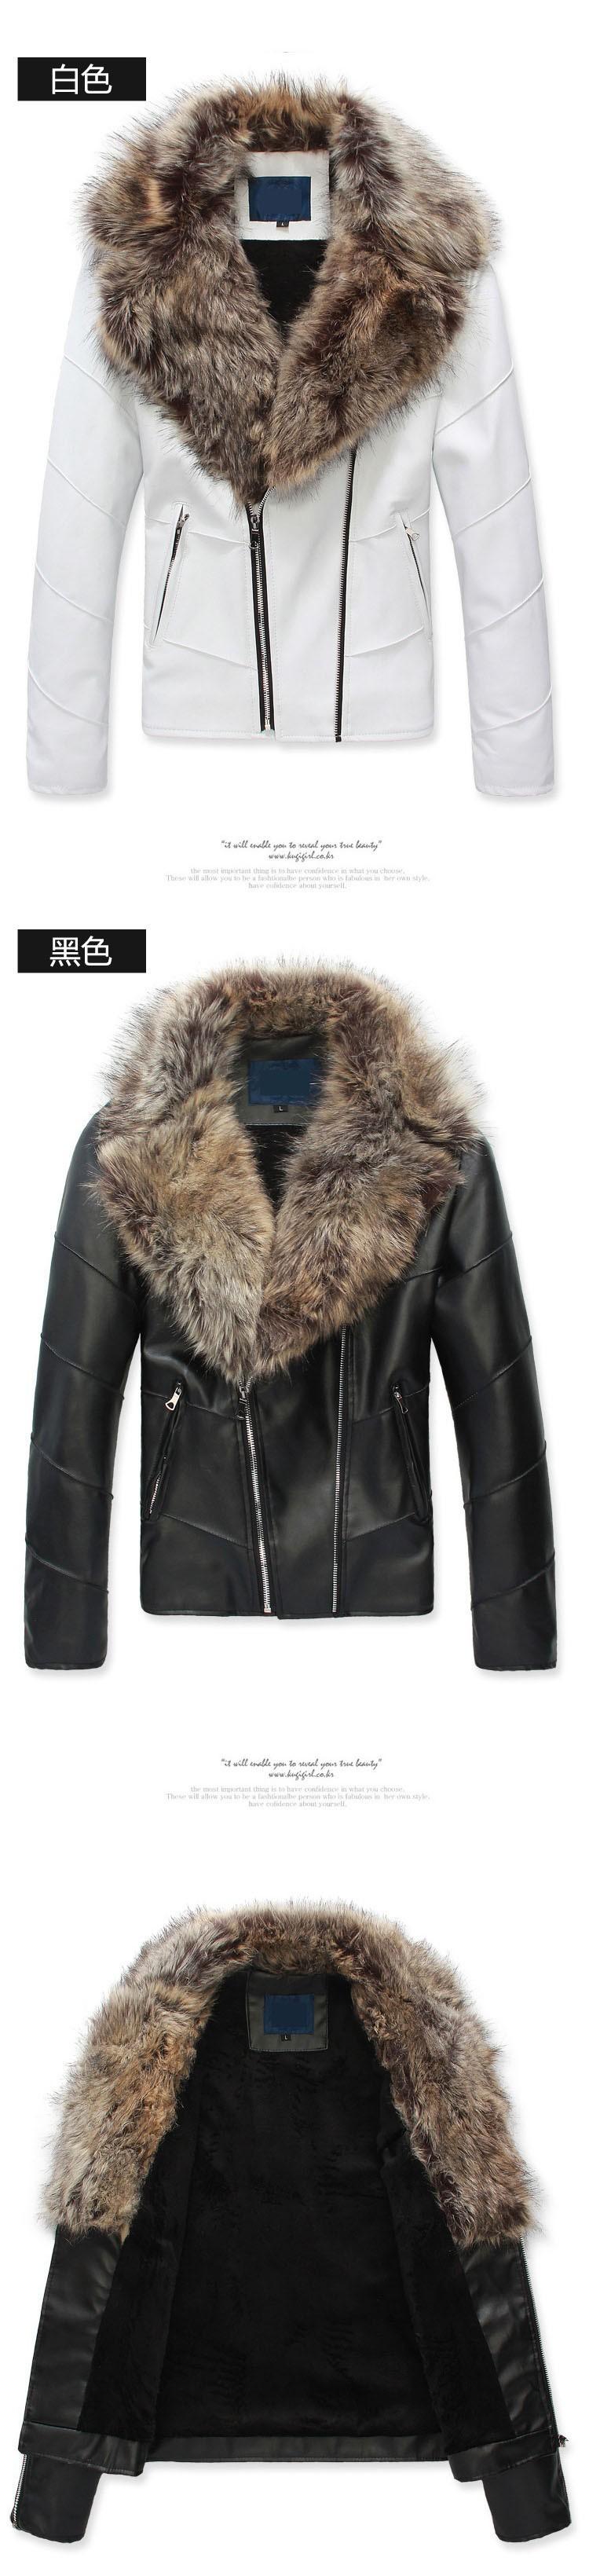 Leather jacket men fur coat biker jacket motorcycle 2015 fashion famous brand slim men leather jacket with fur collar2